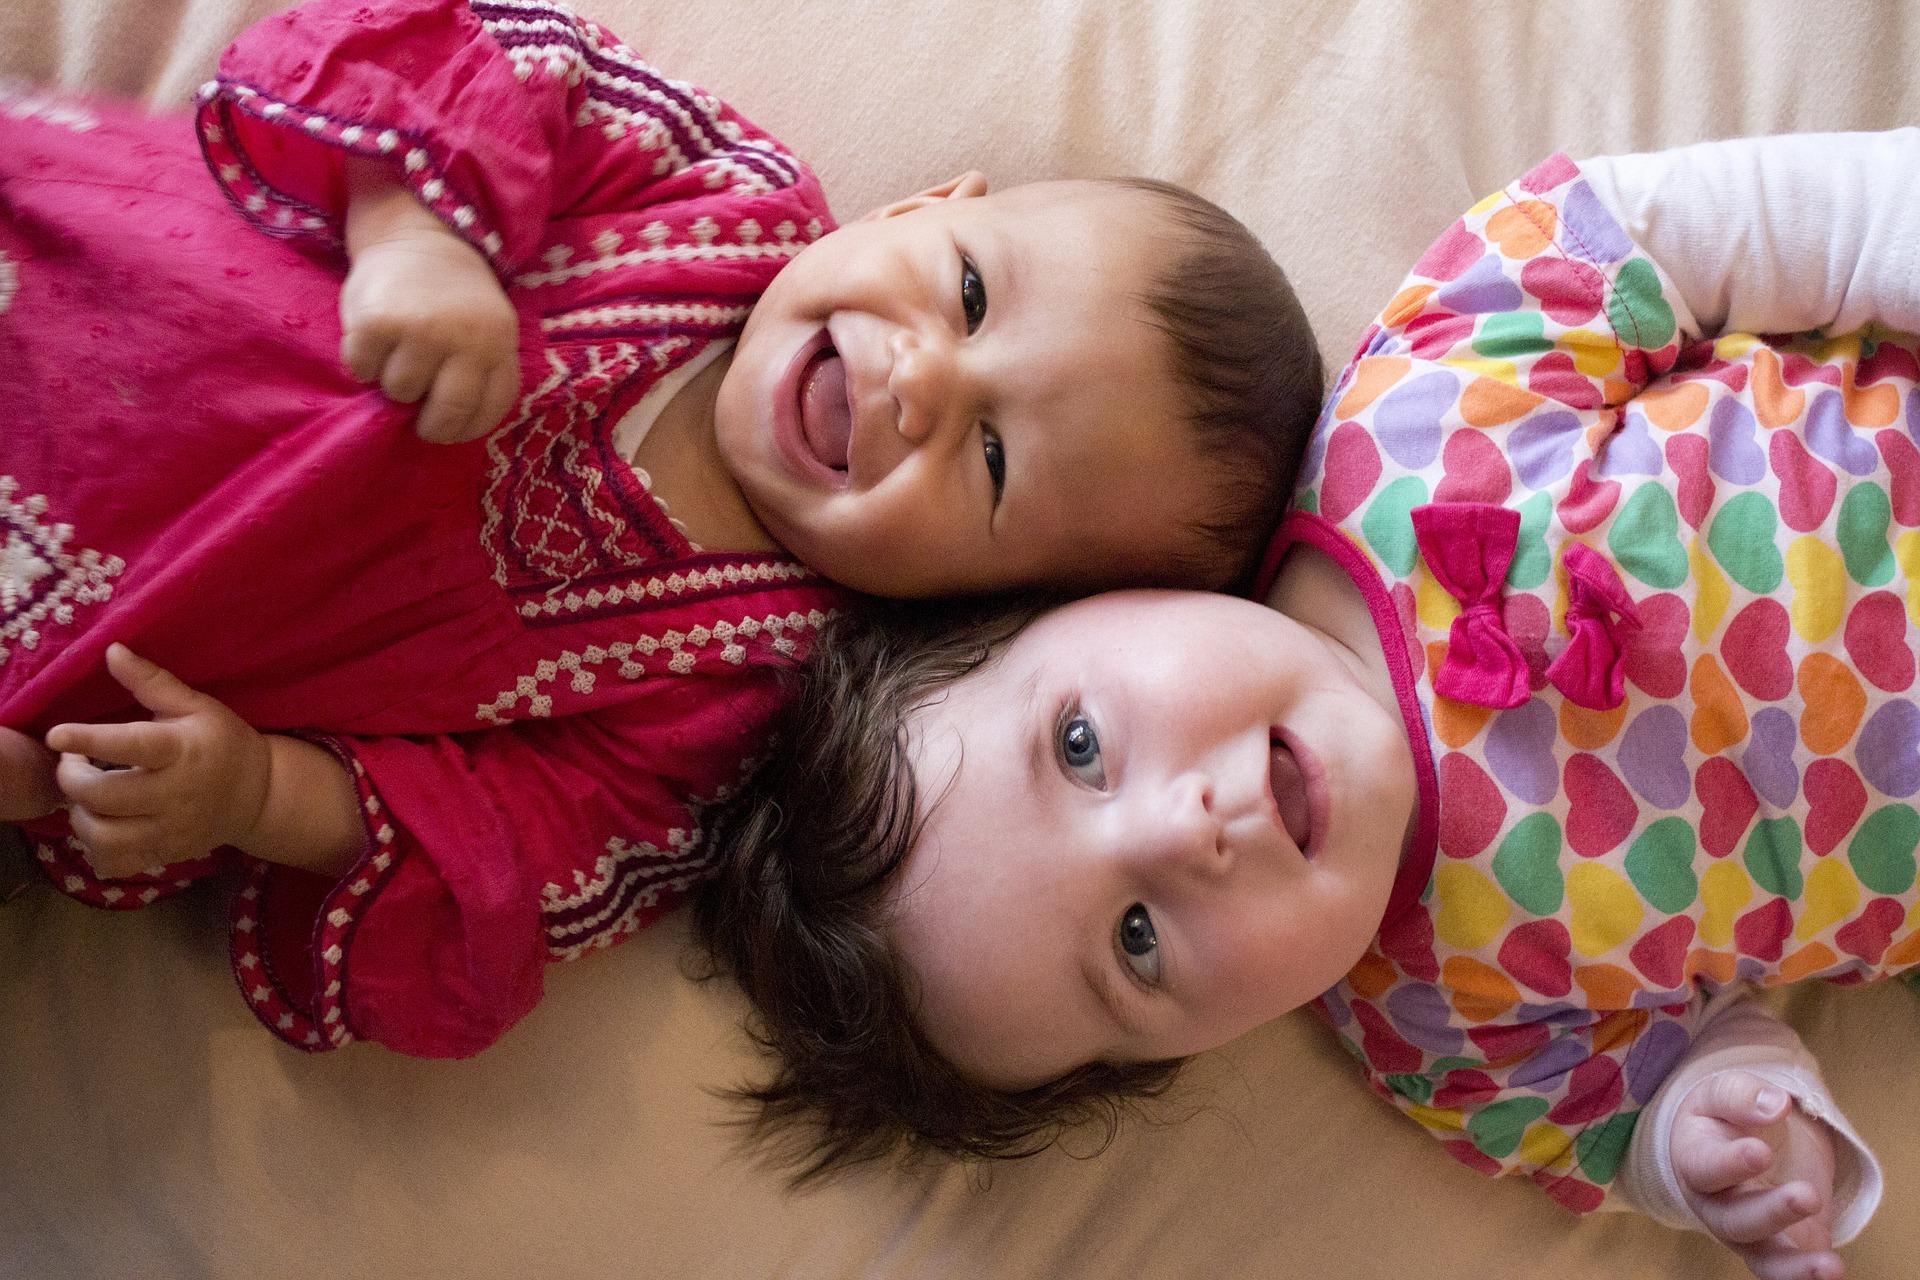 Image: Two babies talking and smiling at camera